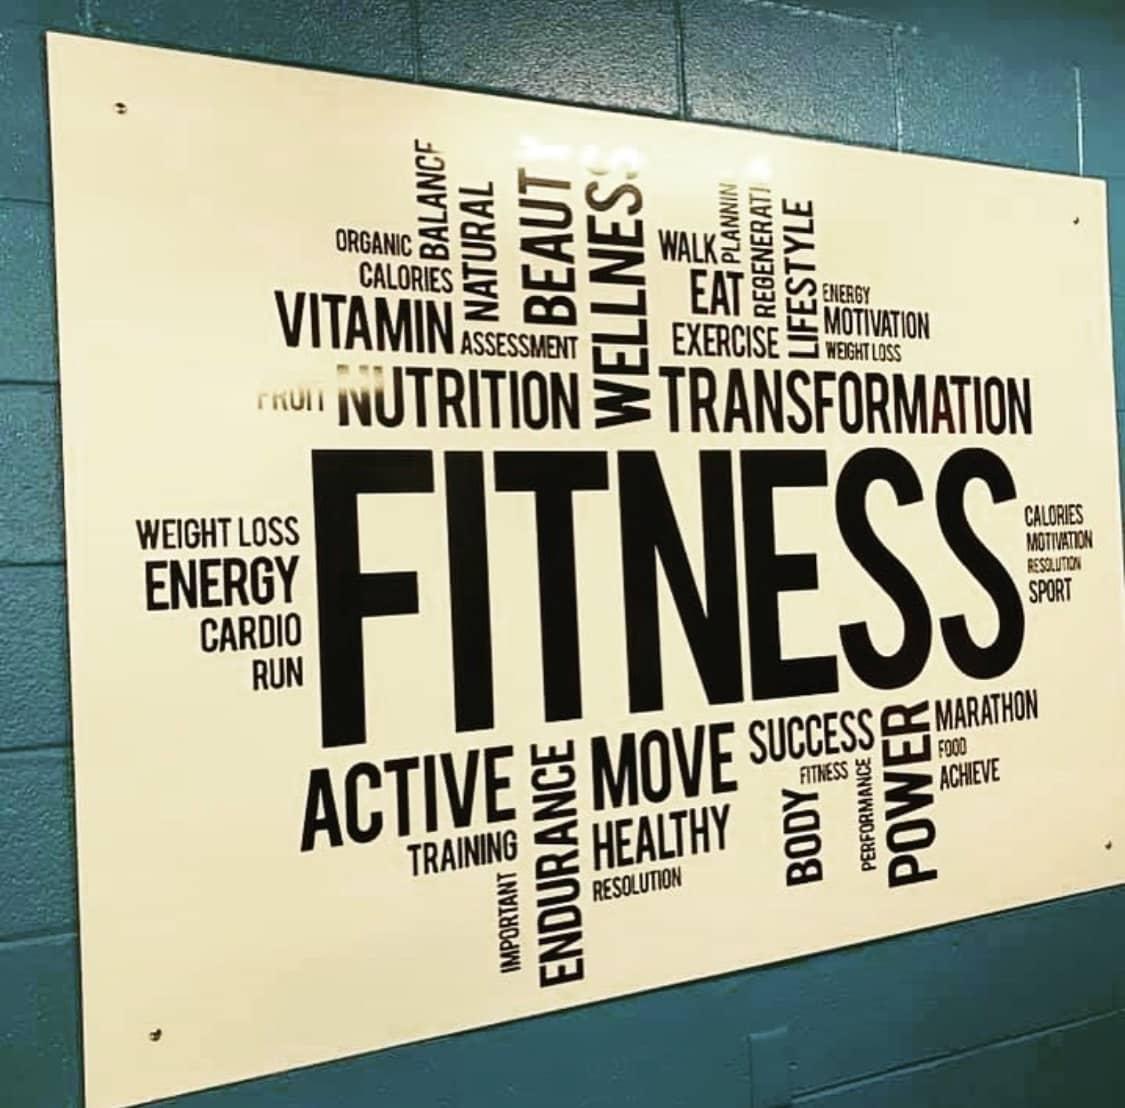 Fitness Center Sign